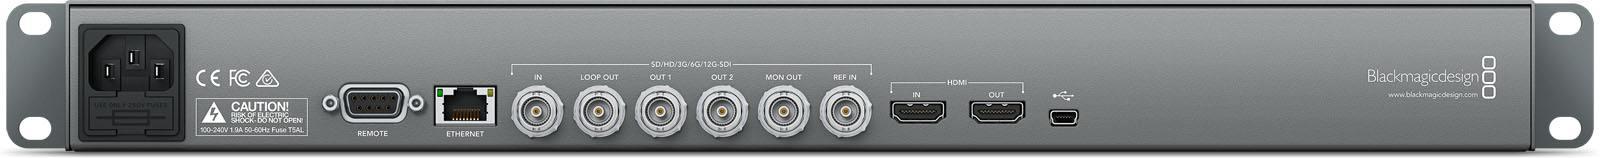 Blackmagic Design HyperDeck Studio 12G - HYPERD/ST/12G - Rear Connections